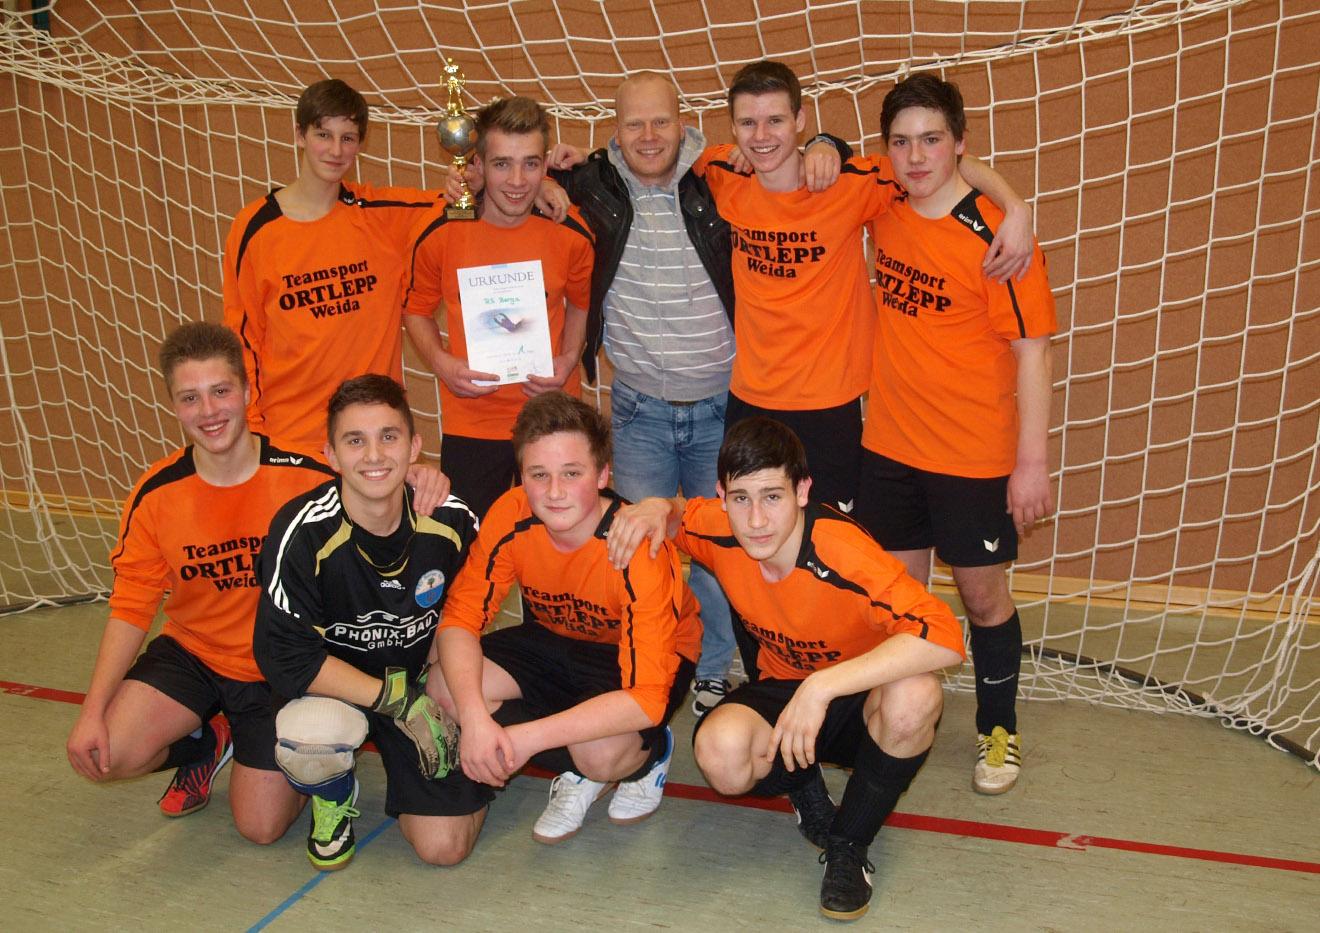 Rudi-Geiger-Pokal 2015 im Hallenfußball